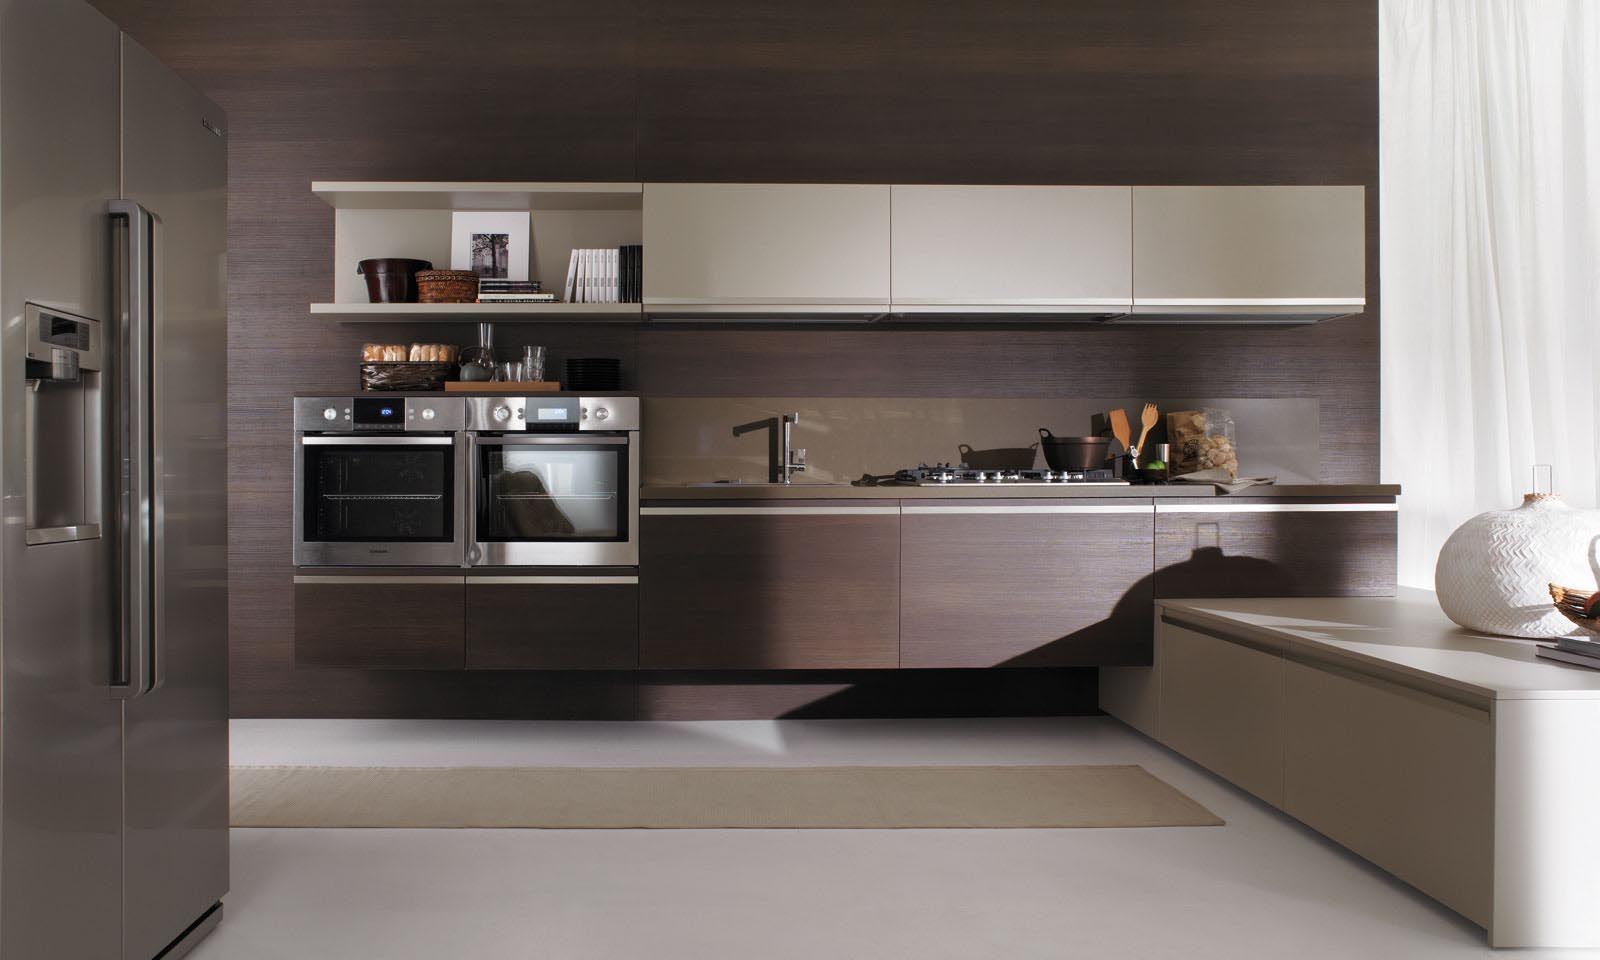 Bontempi Cucine   Inspirations - Kitchens   Pinterest   Kitchens